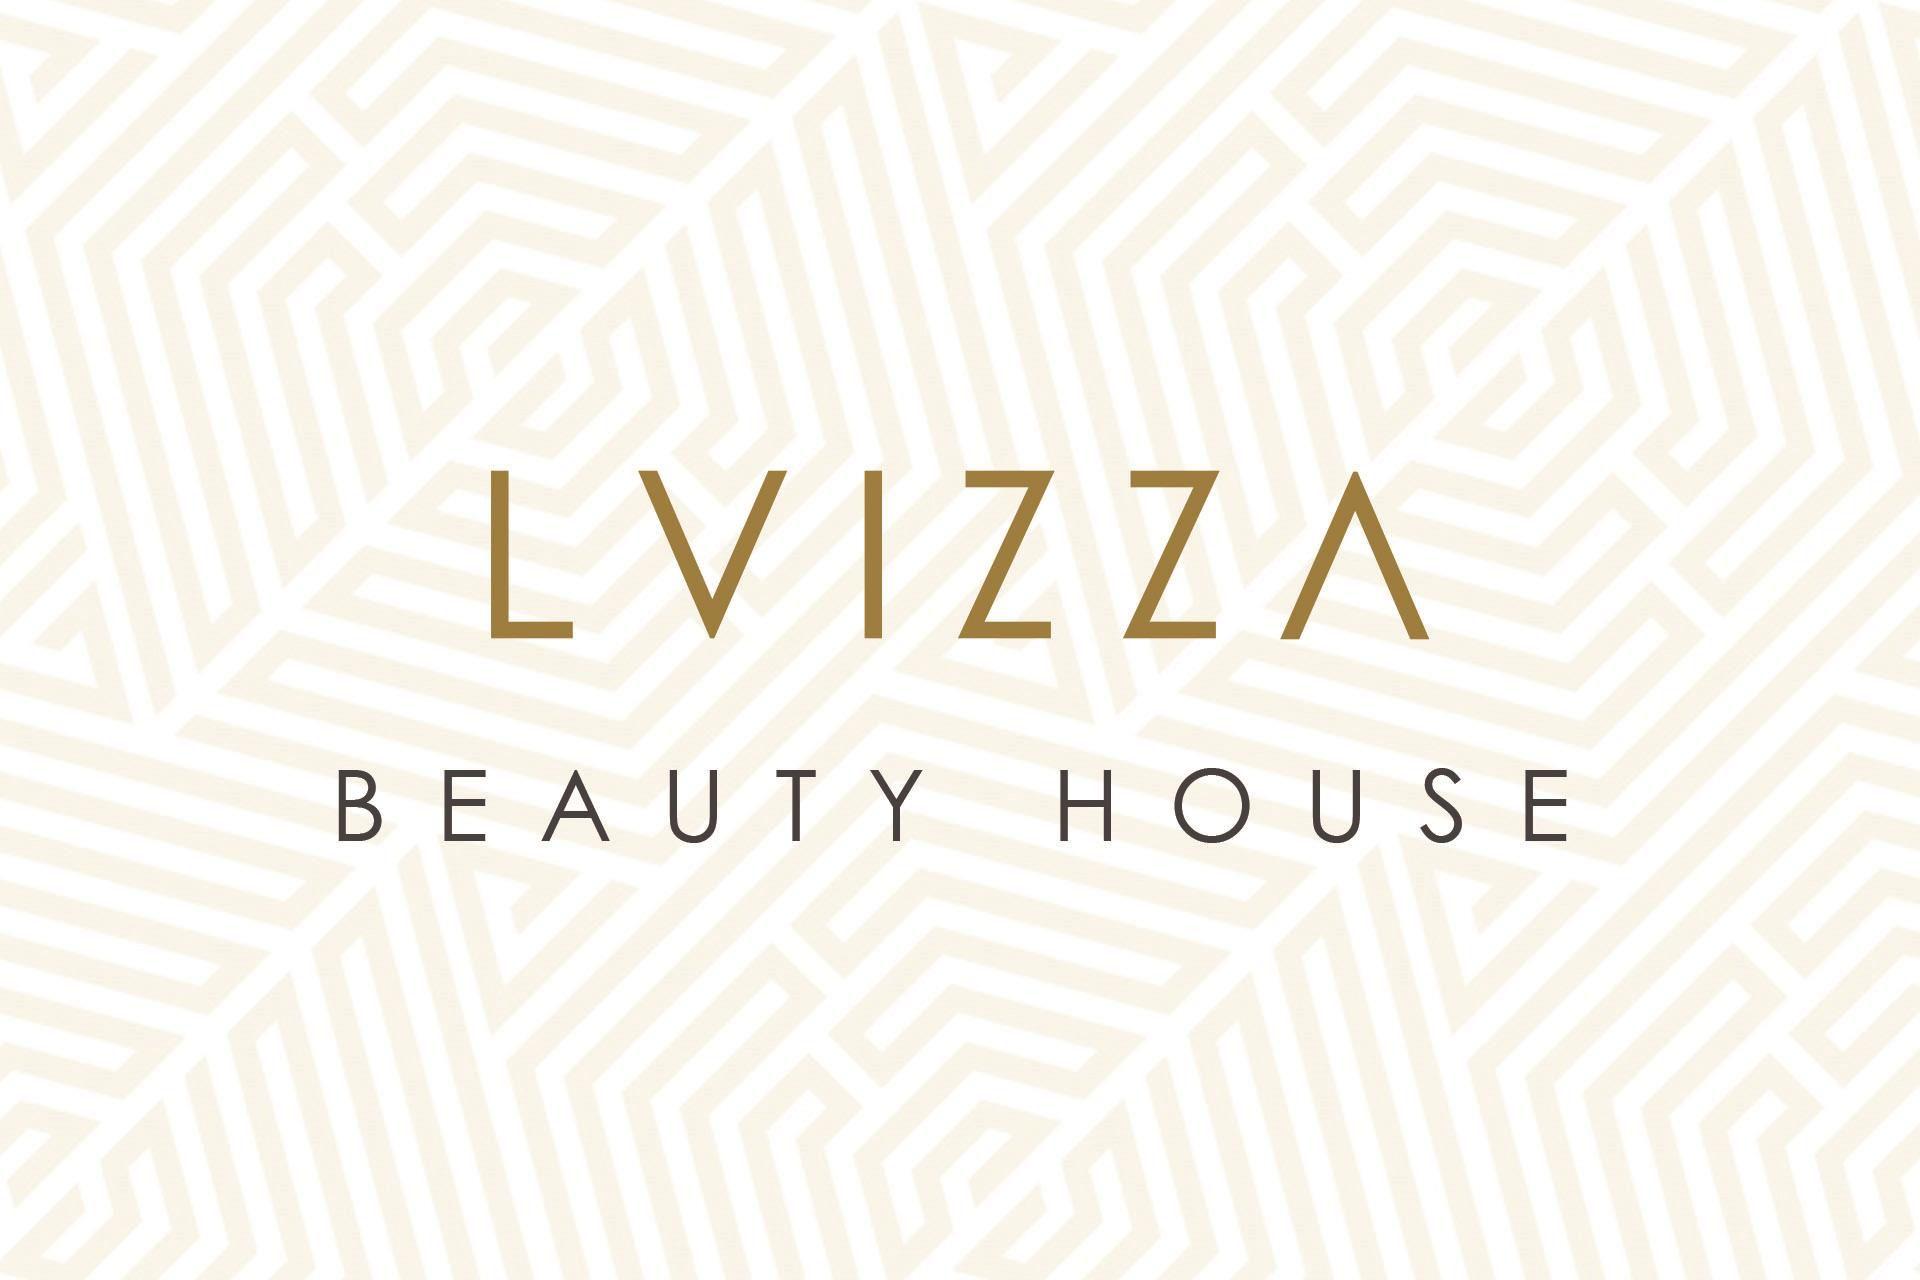 Lvizza Beauty House In Denver Co Vagaro House Of Beauty Beauty Studio Fitness Studio Business